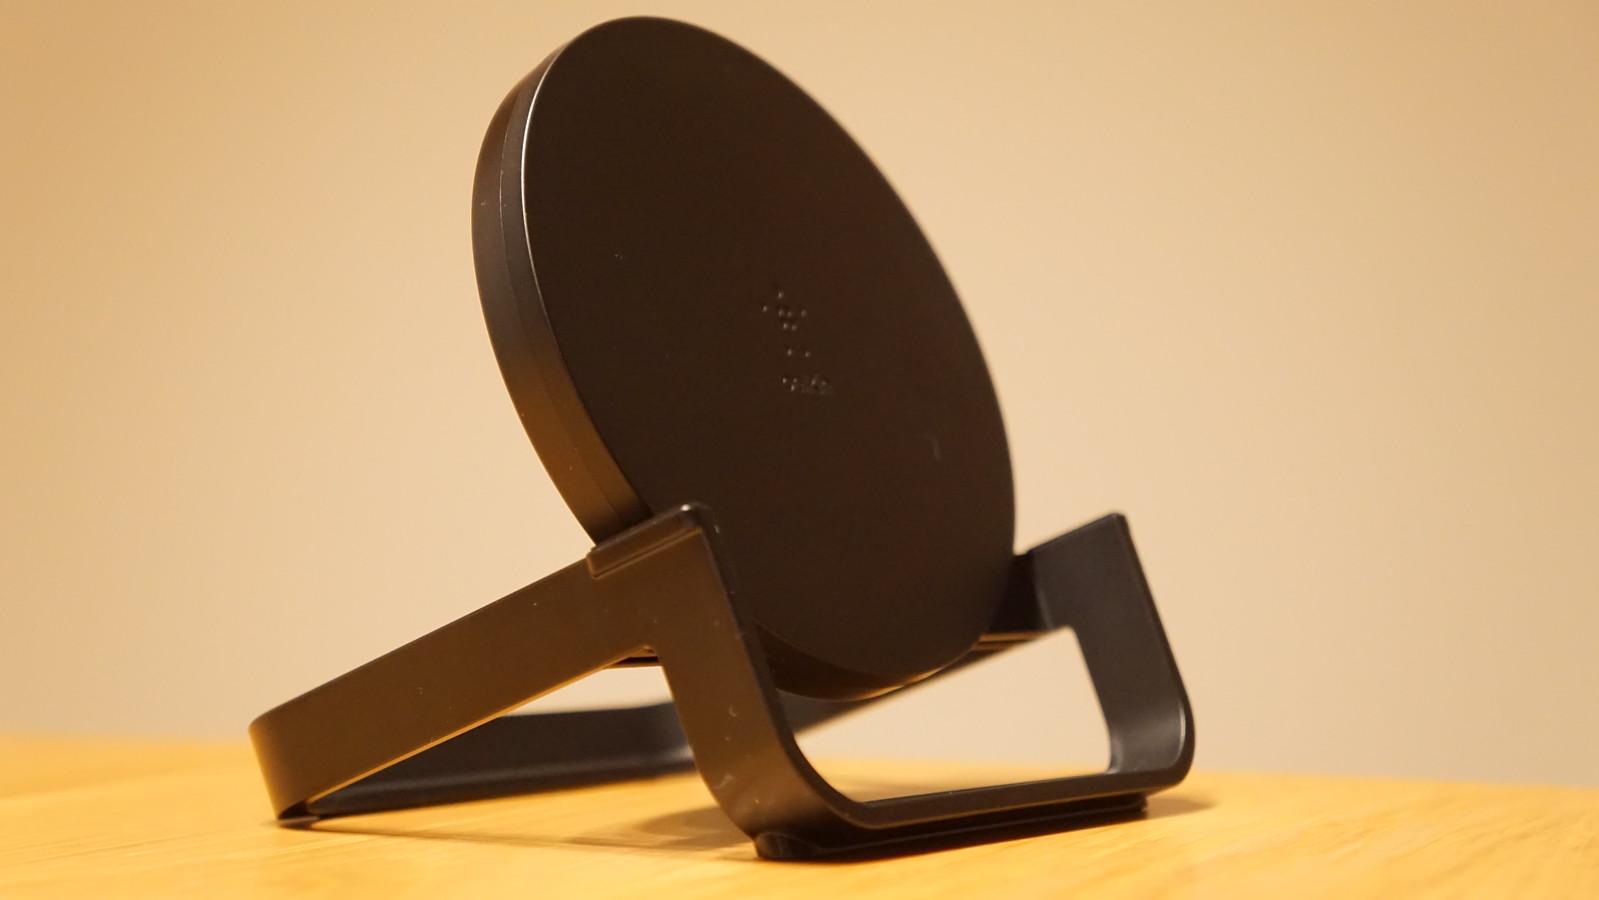 「BOOST↑UP ワイヤレス充電スタンド」のデザイン